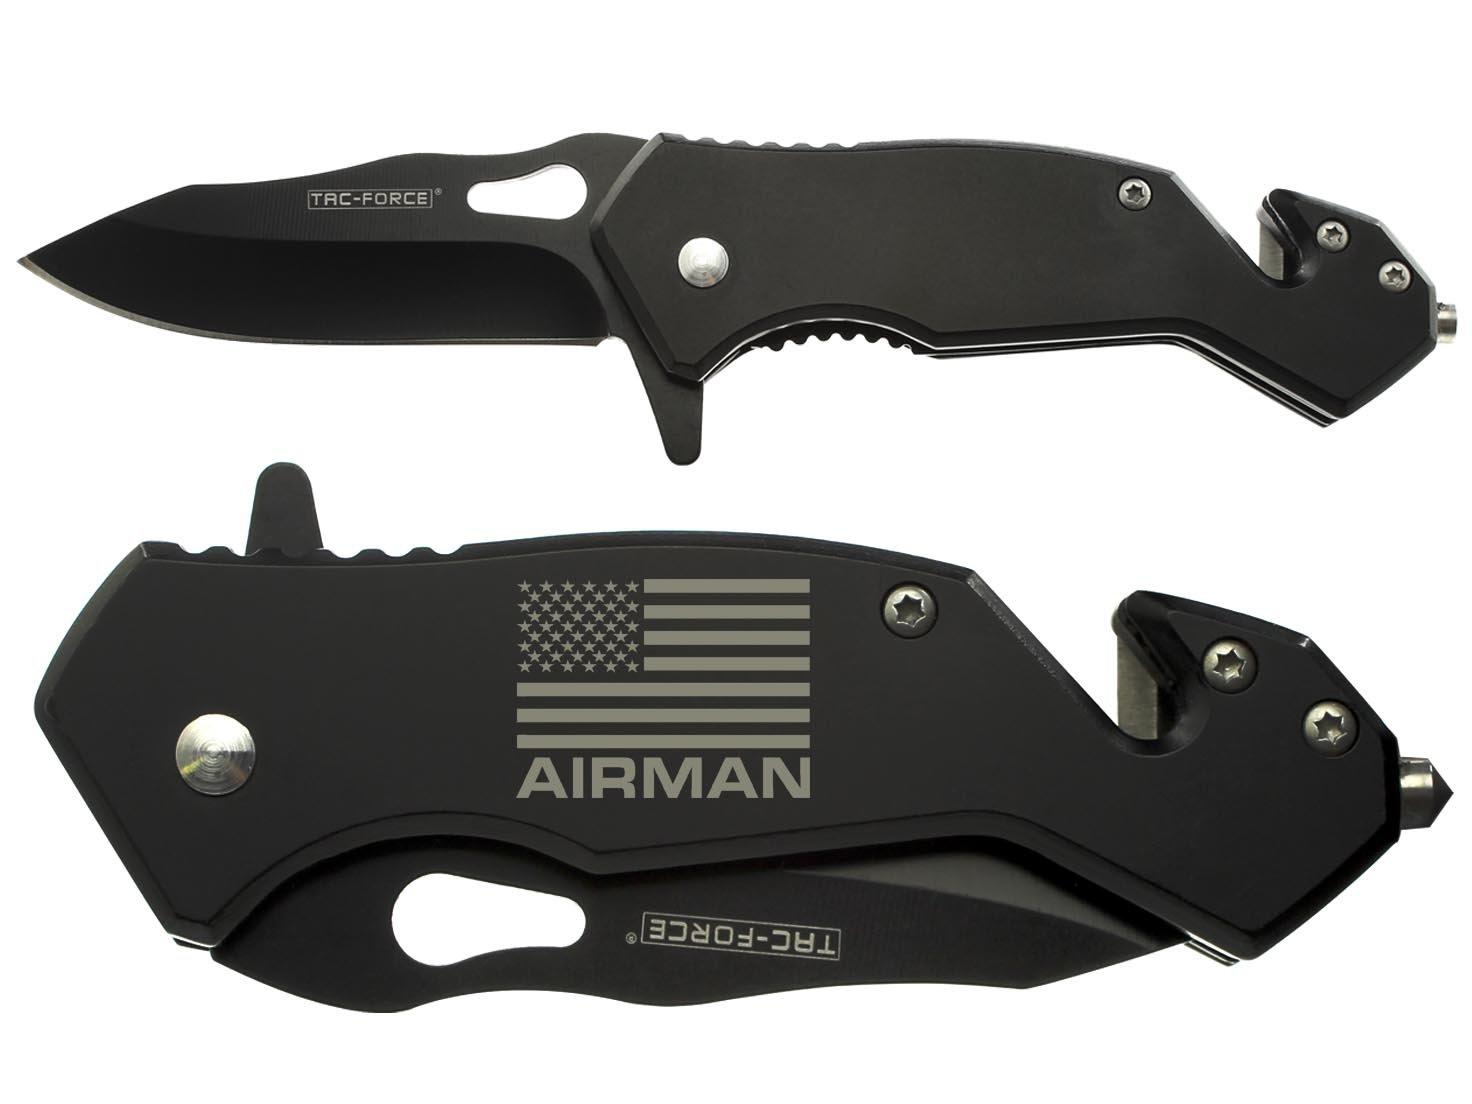 NDZ Performance Tac-Force 6.5'' Tactical Rescue Folding Knife Glass Breaker Seat-Belt Cutter 903BK Compact Black Us Flag Air Man 001